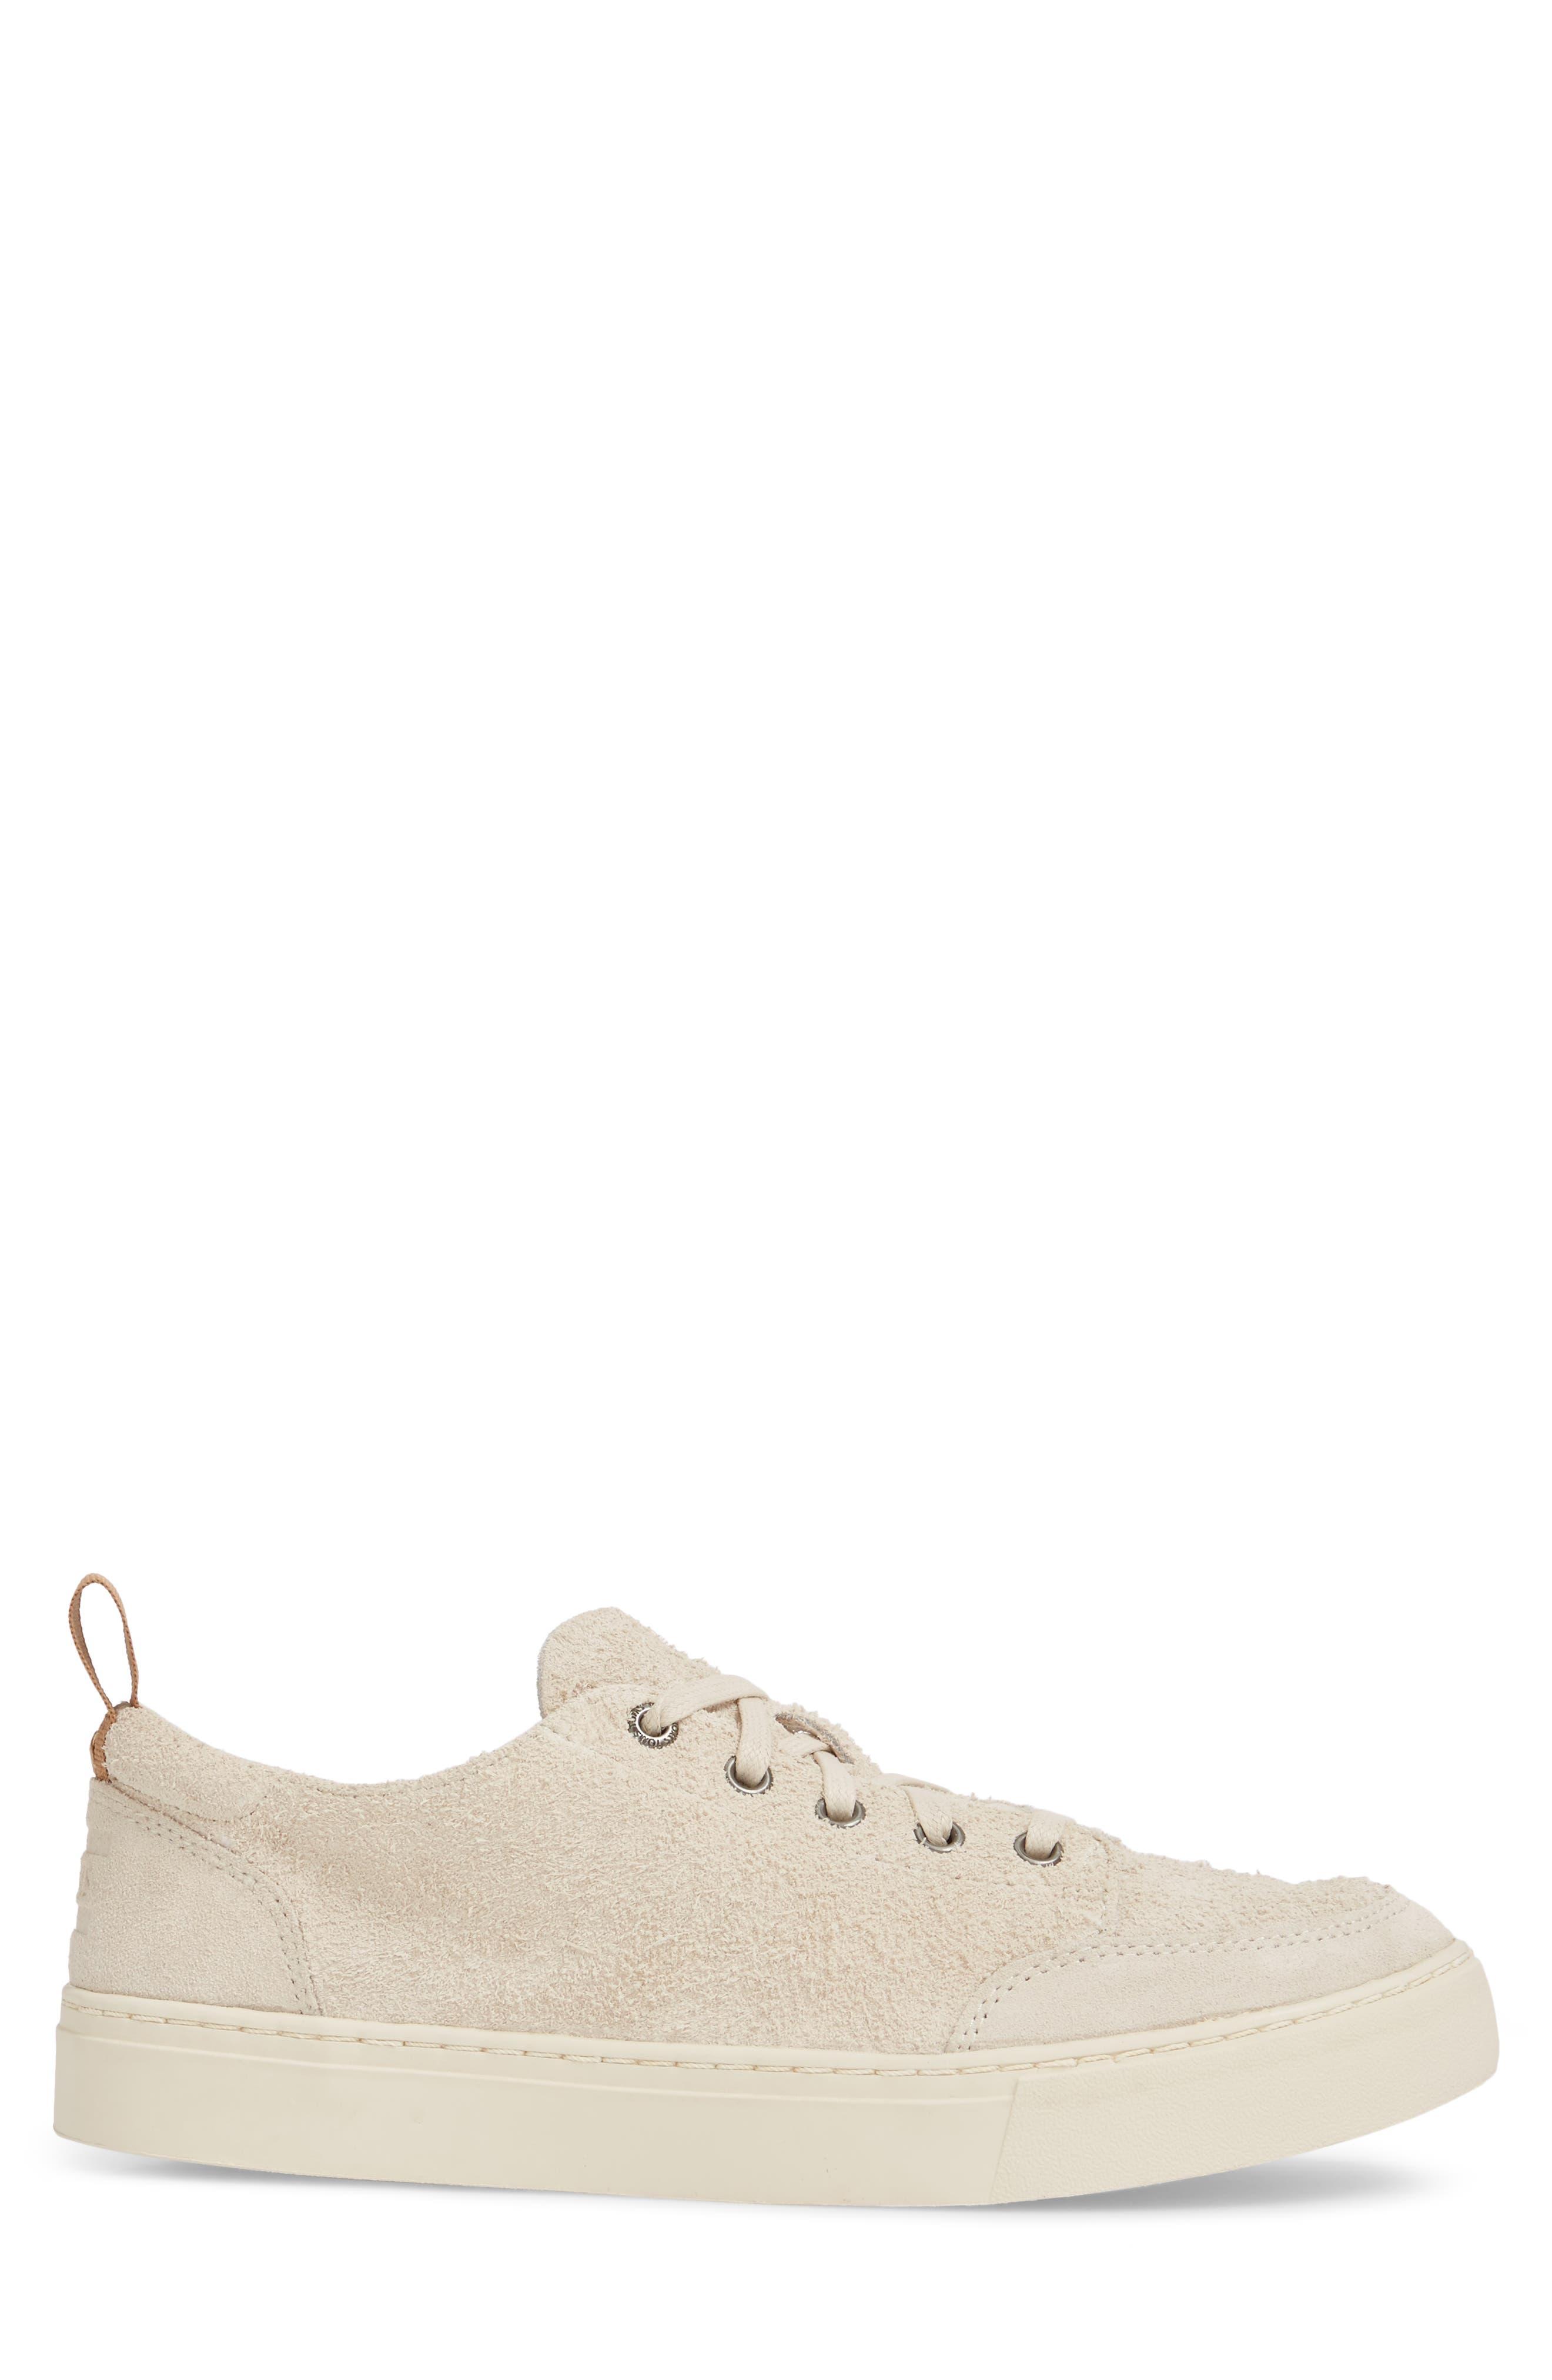 Landen Sneaker,                             Alternate thumbnail 3, color,                             BIRCH SHAGGY SUEDE